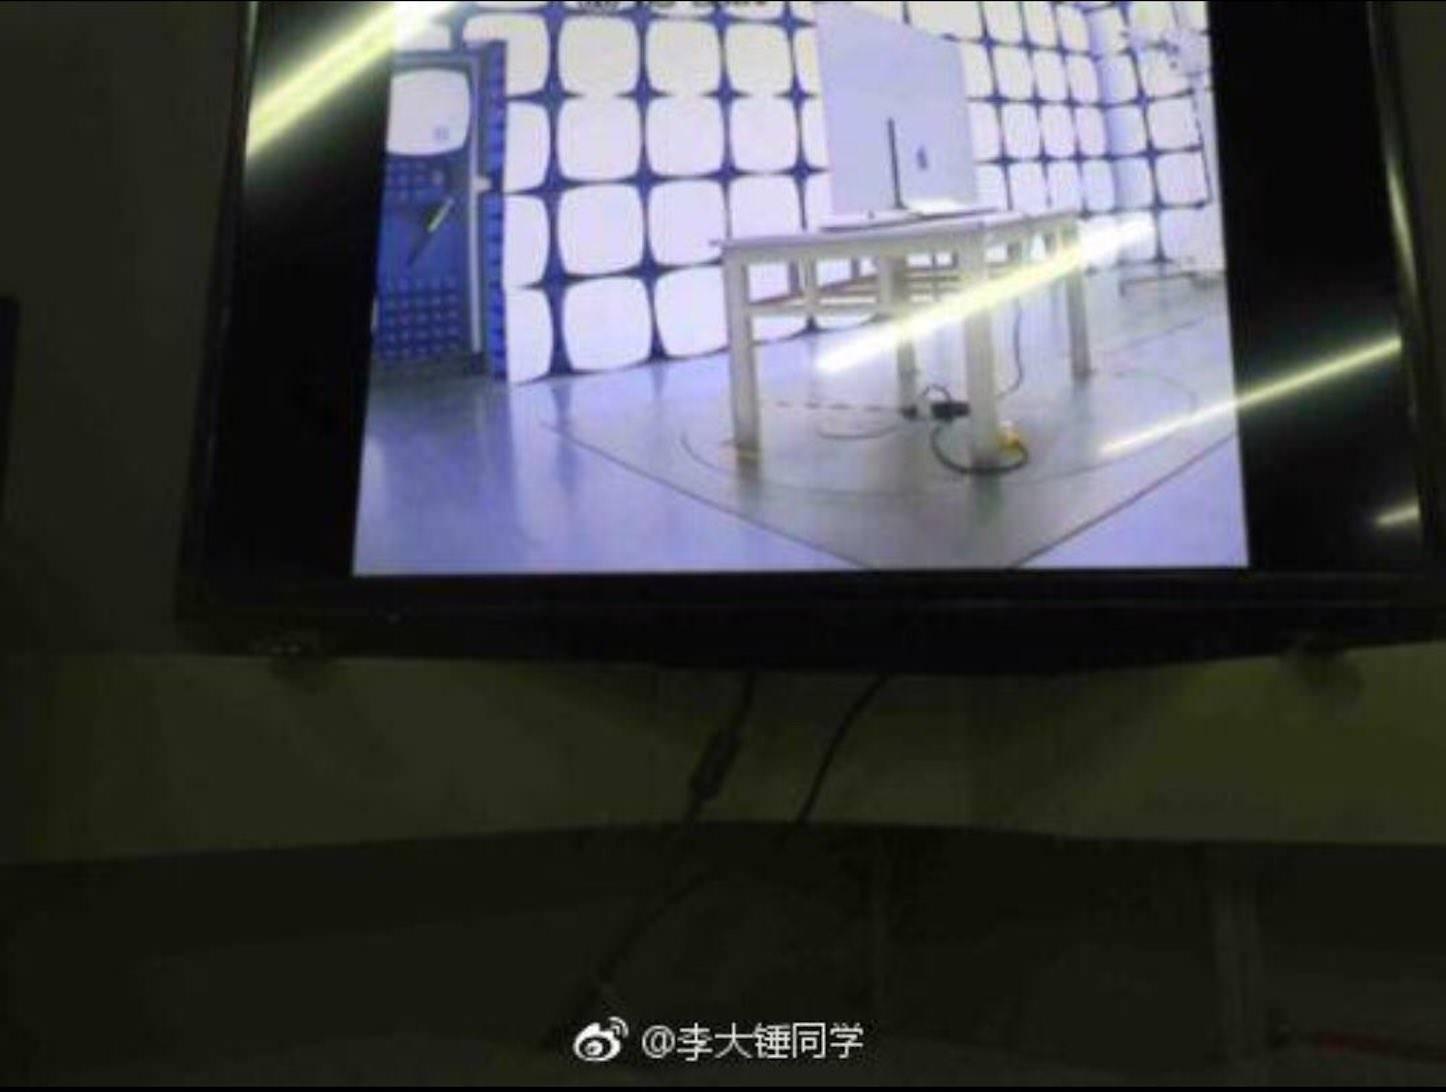 Apple TV Leak Seems Questionable